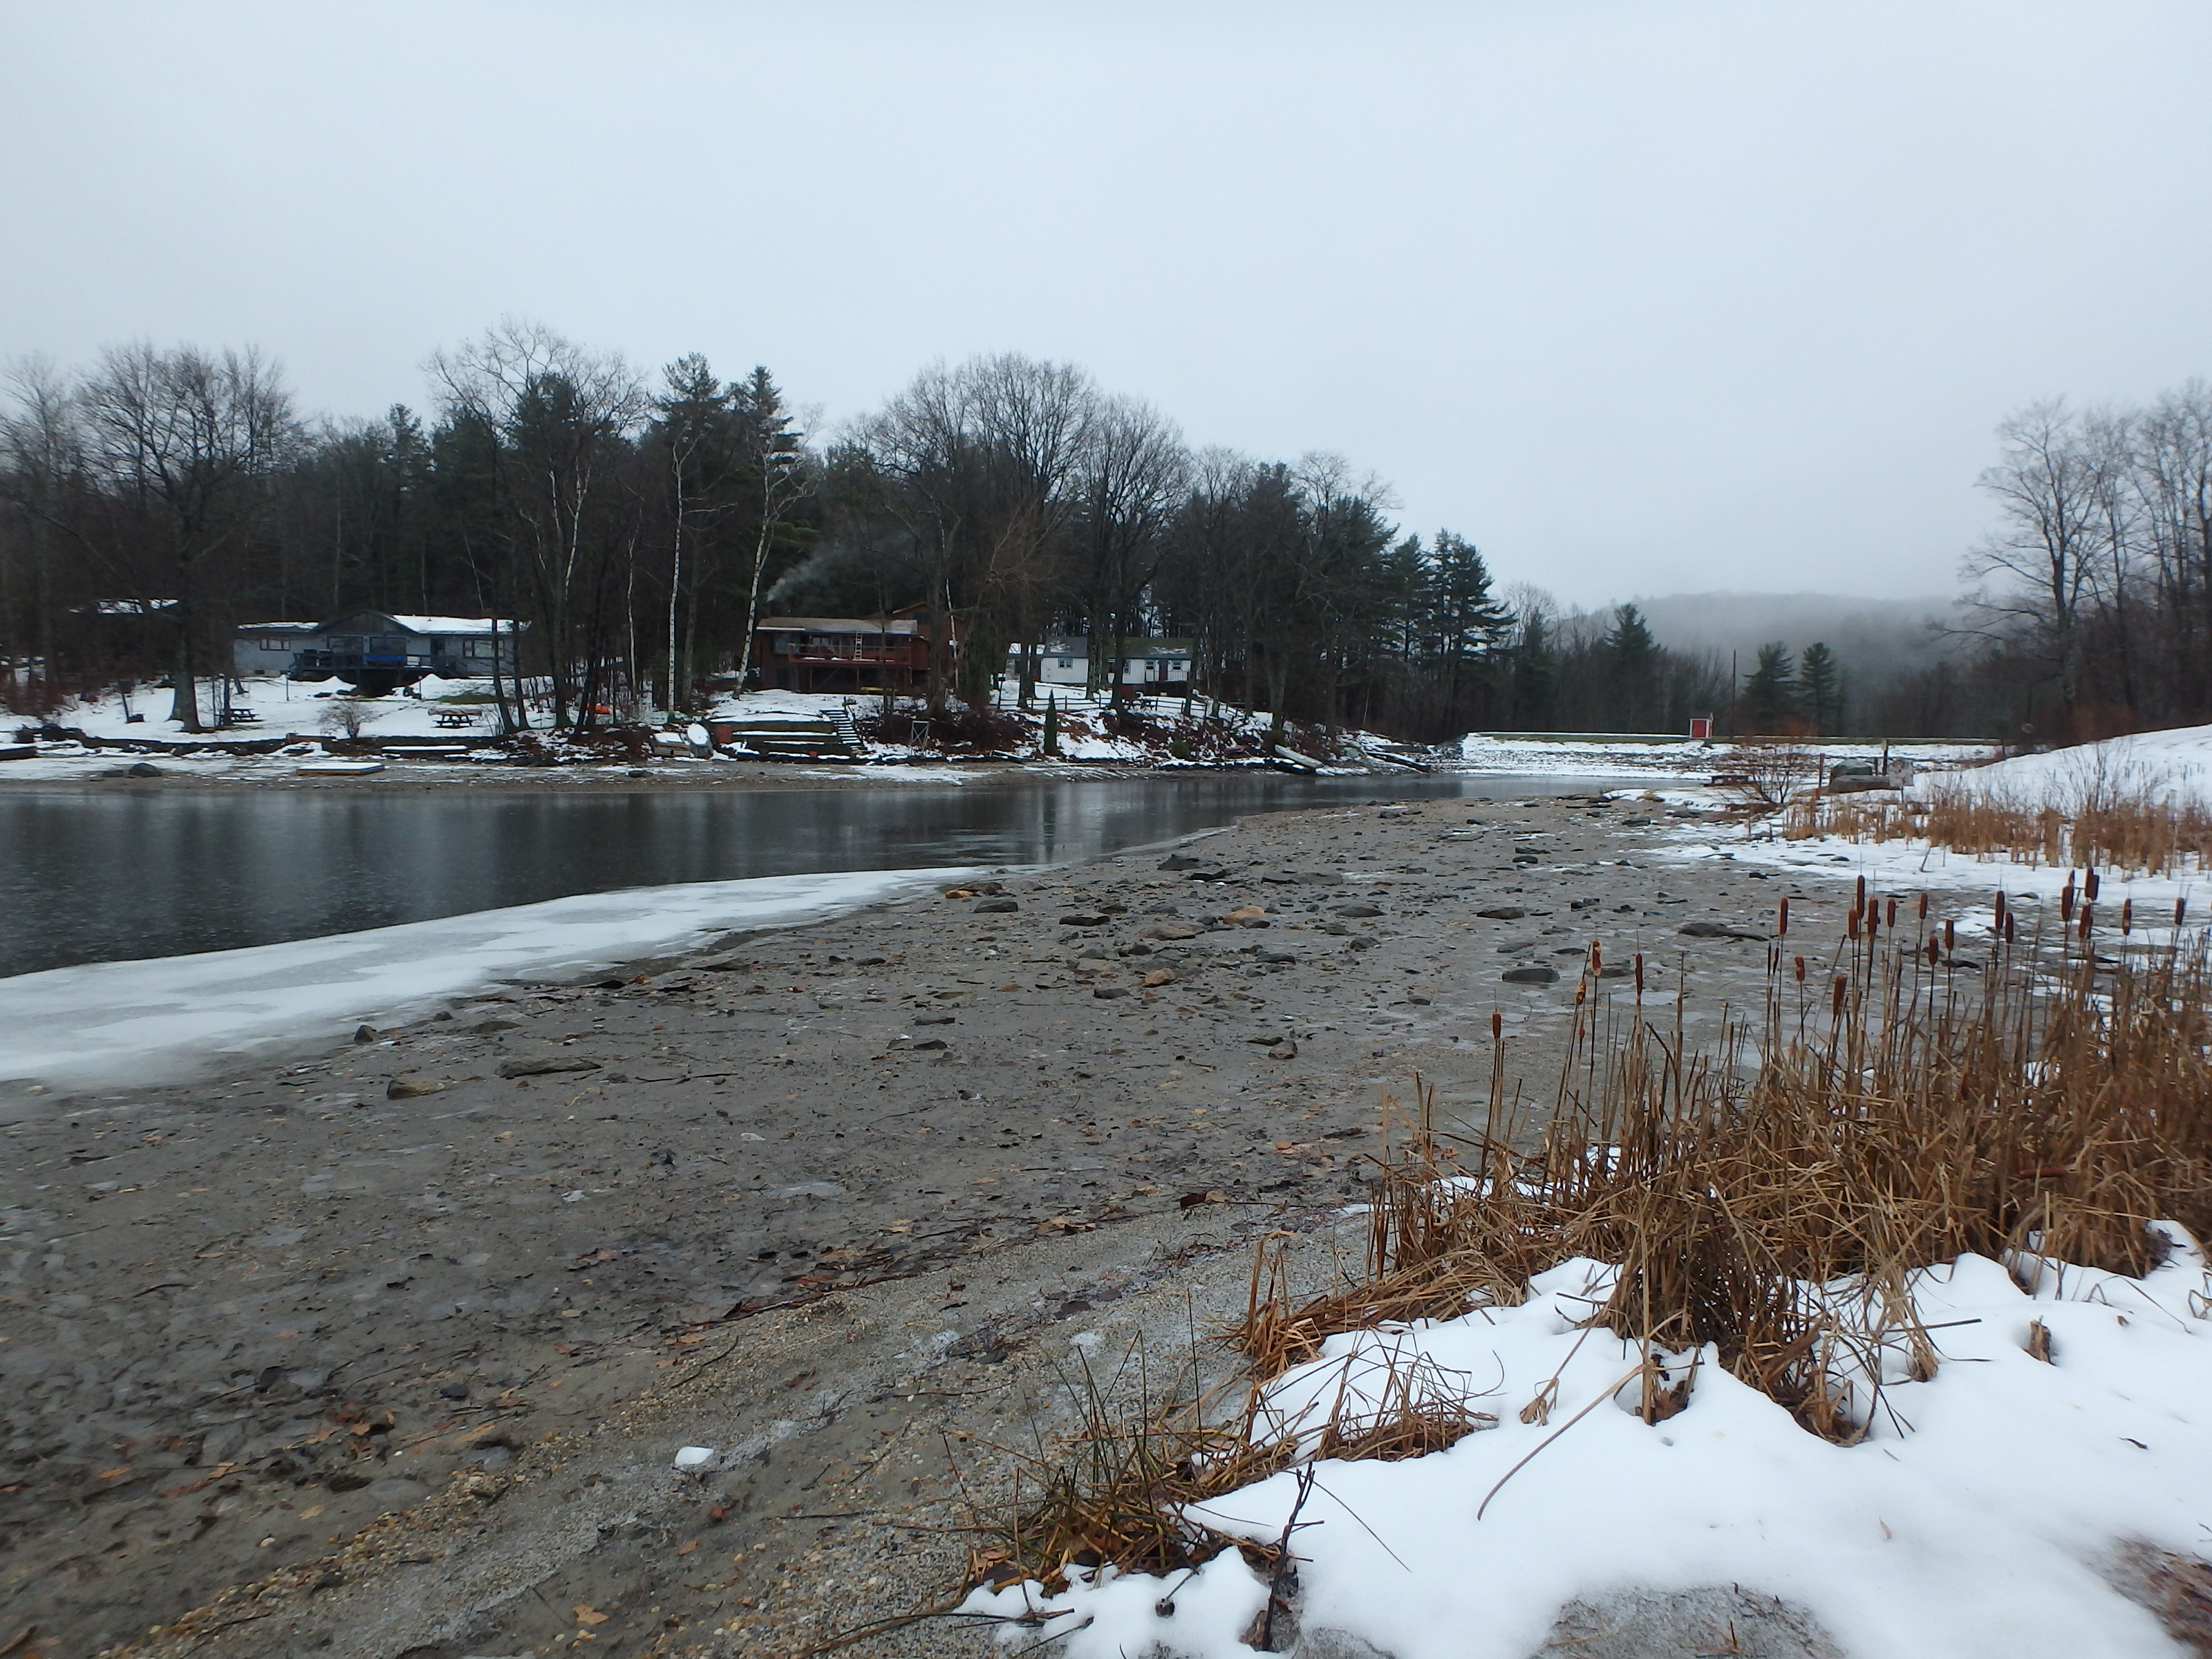 Goose Pond (Tyringham, MA) undergoing a winter drawdown